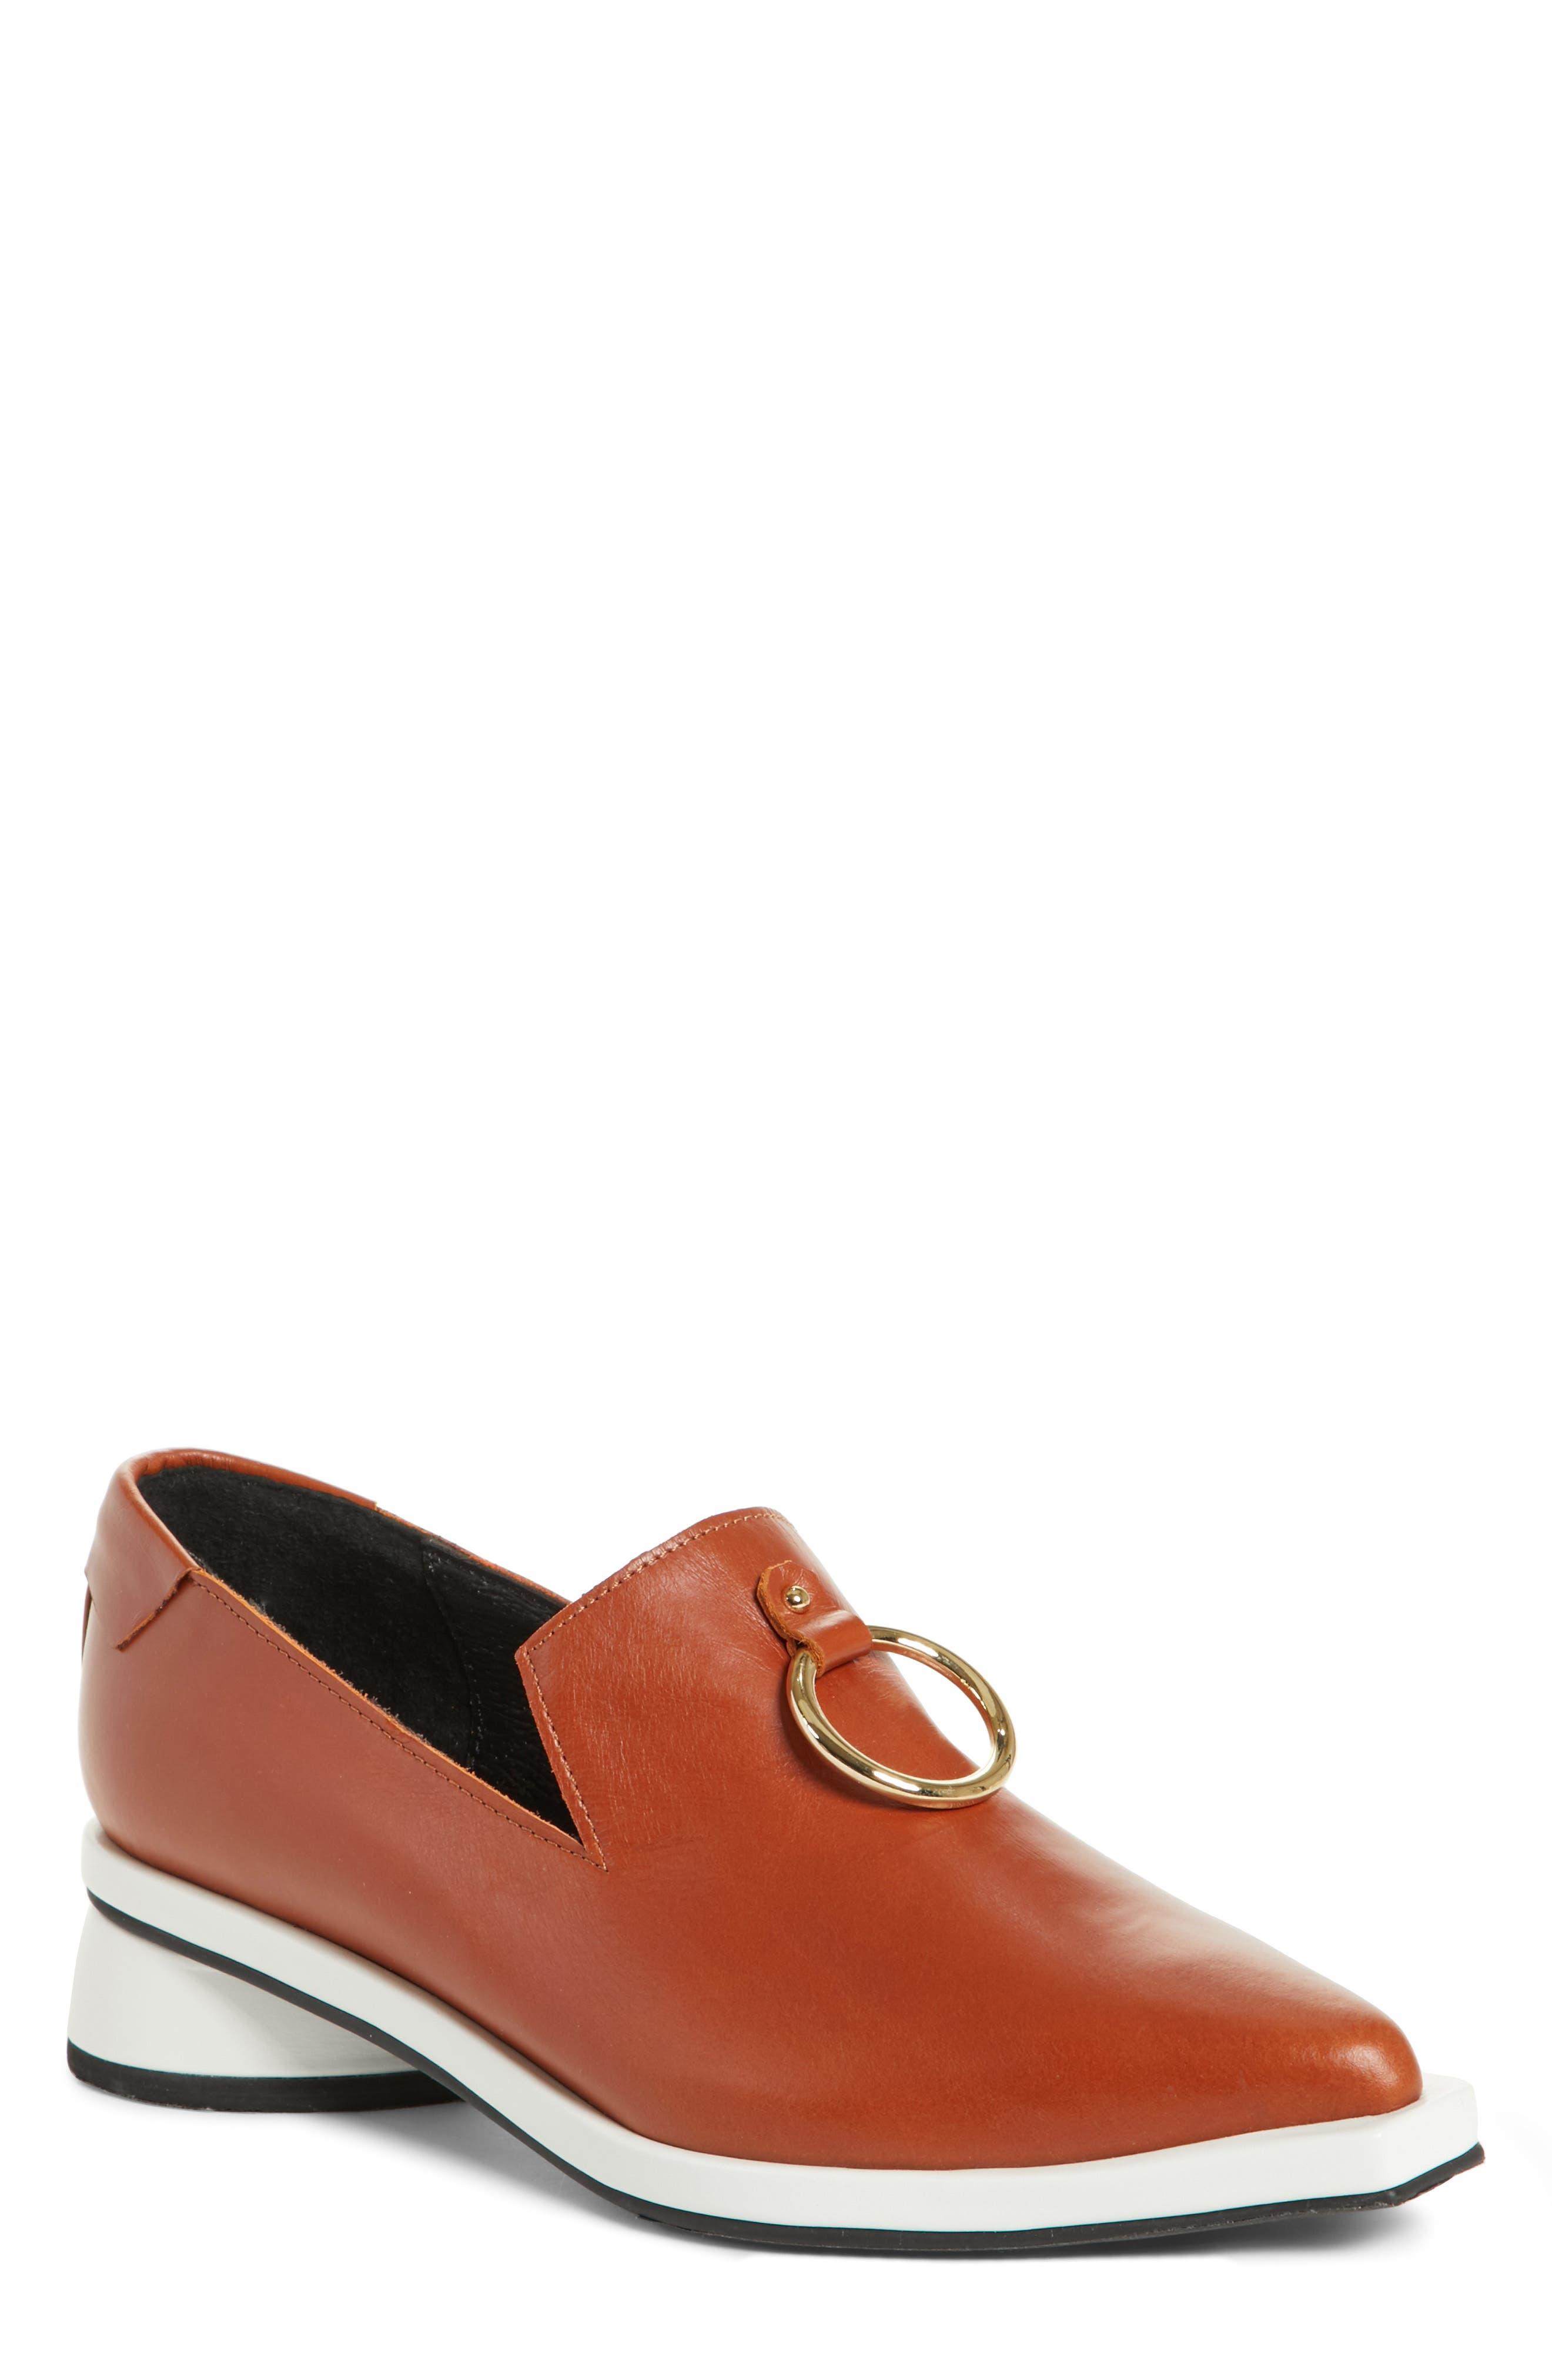 d30ff8b984e Reike Nen Buckle Loafer In Brown White